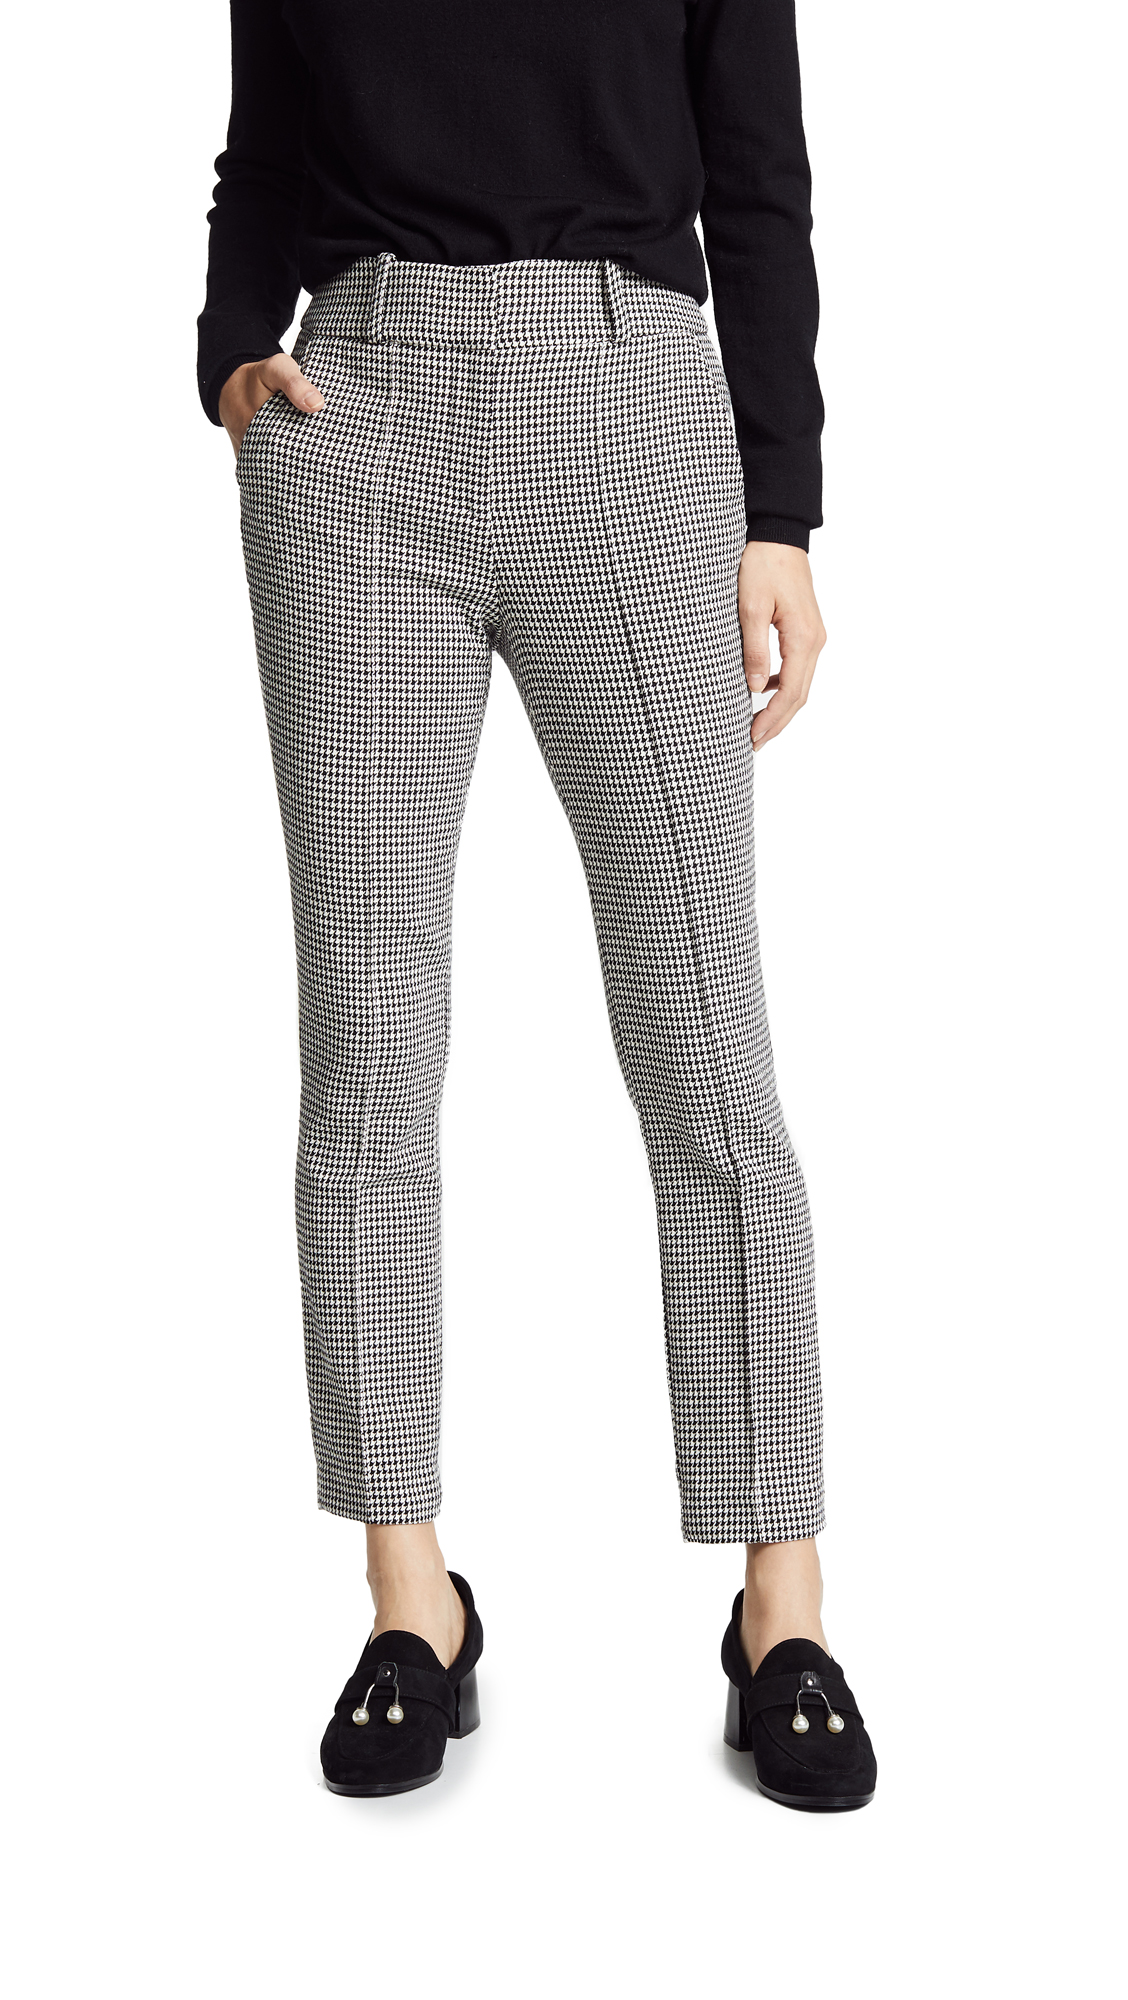 Veronica Beard Lago Trousers - Black/White